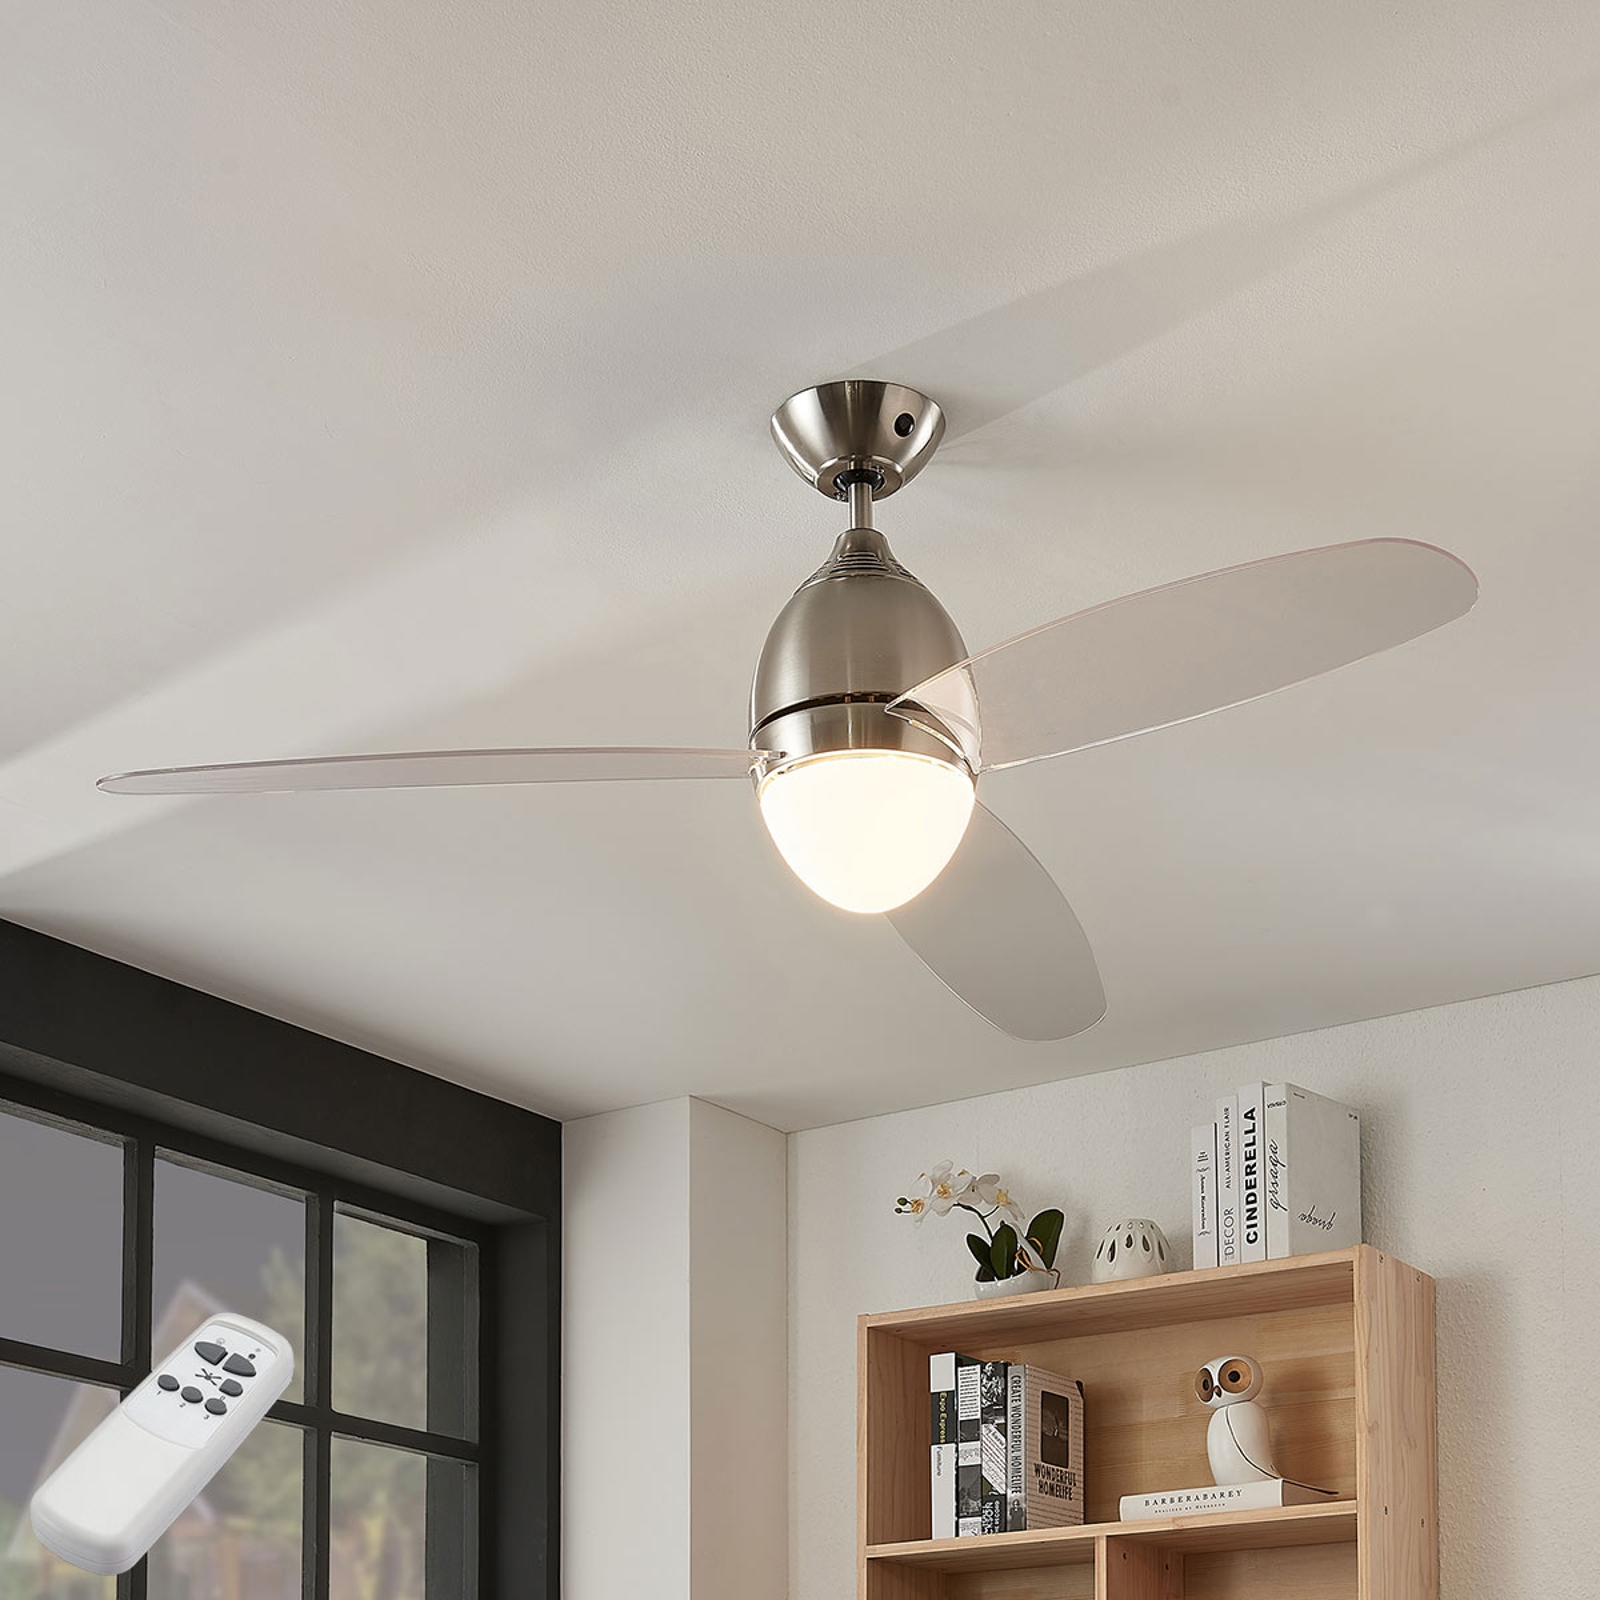 Ventilatore da soffitto Piara, luce, trasparente